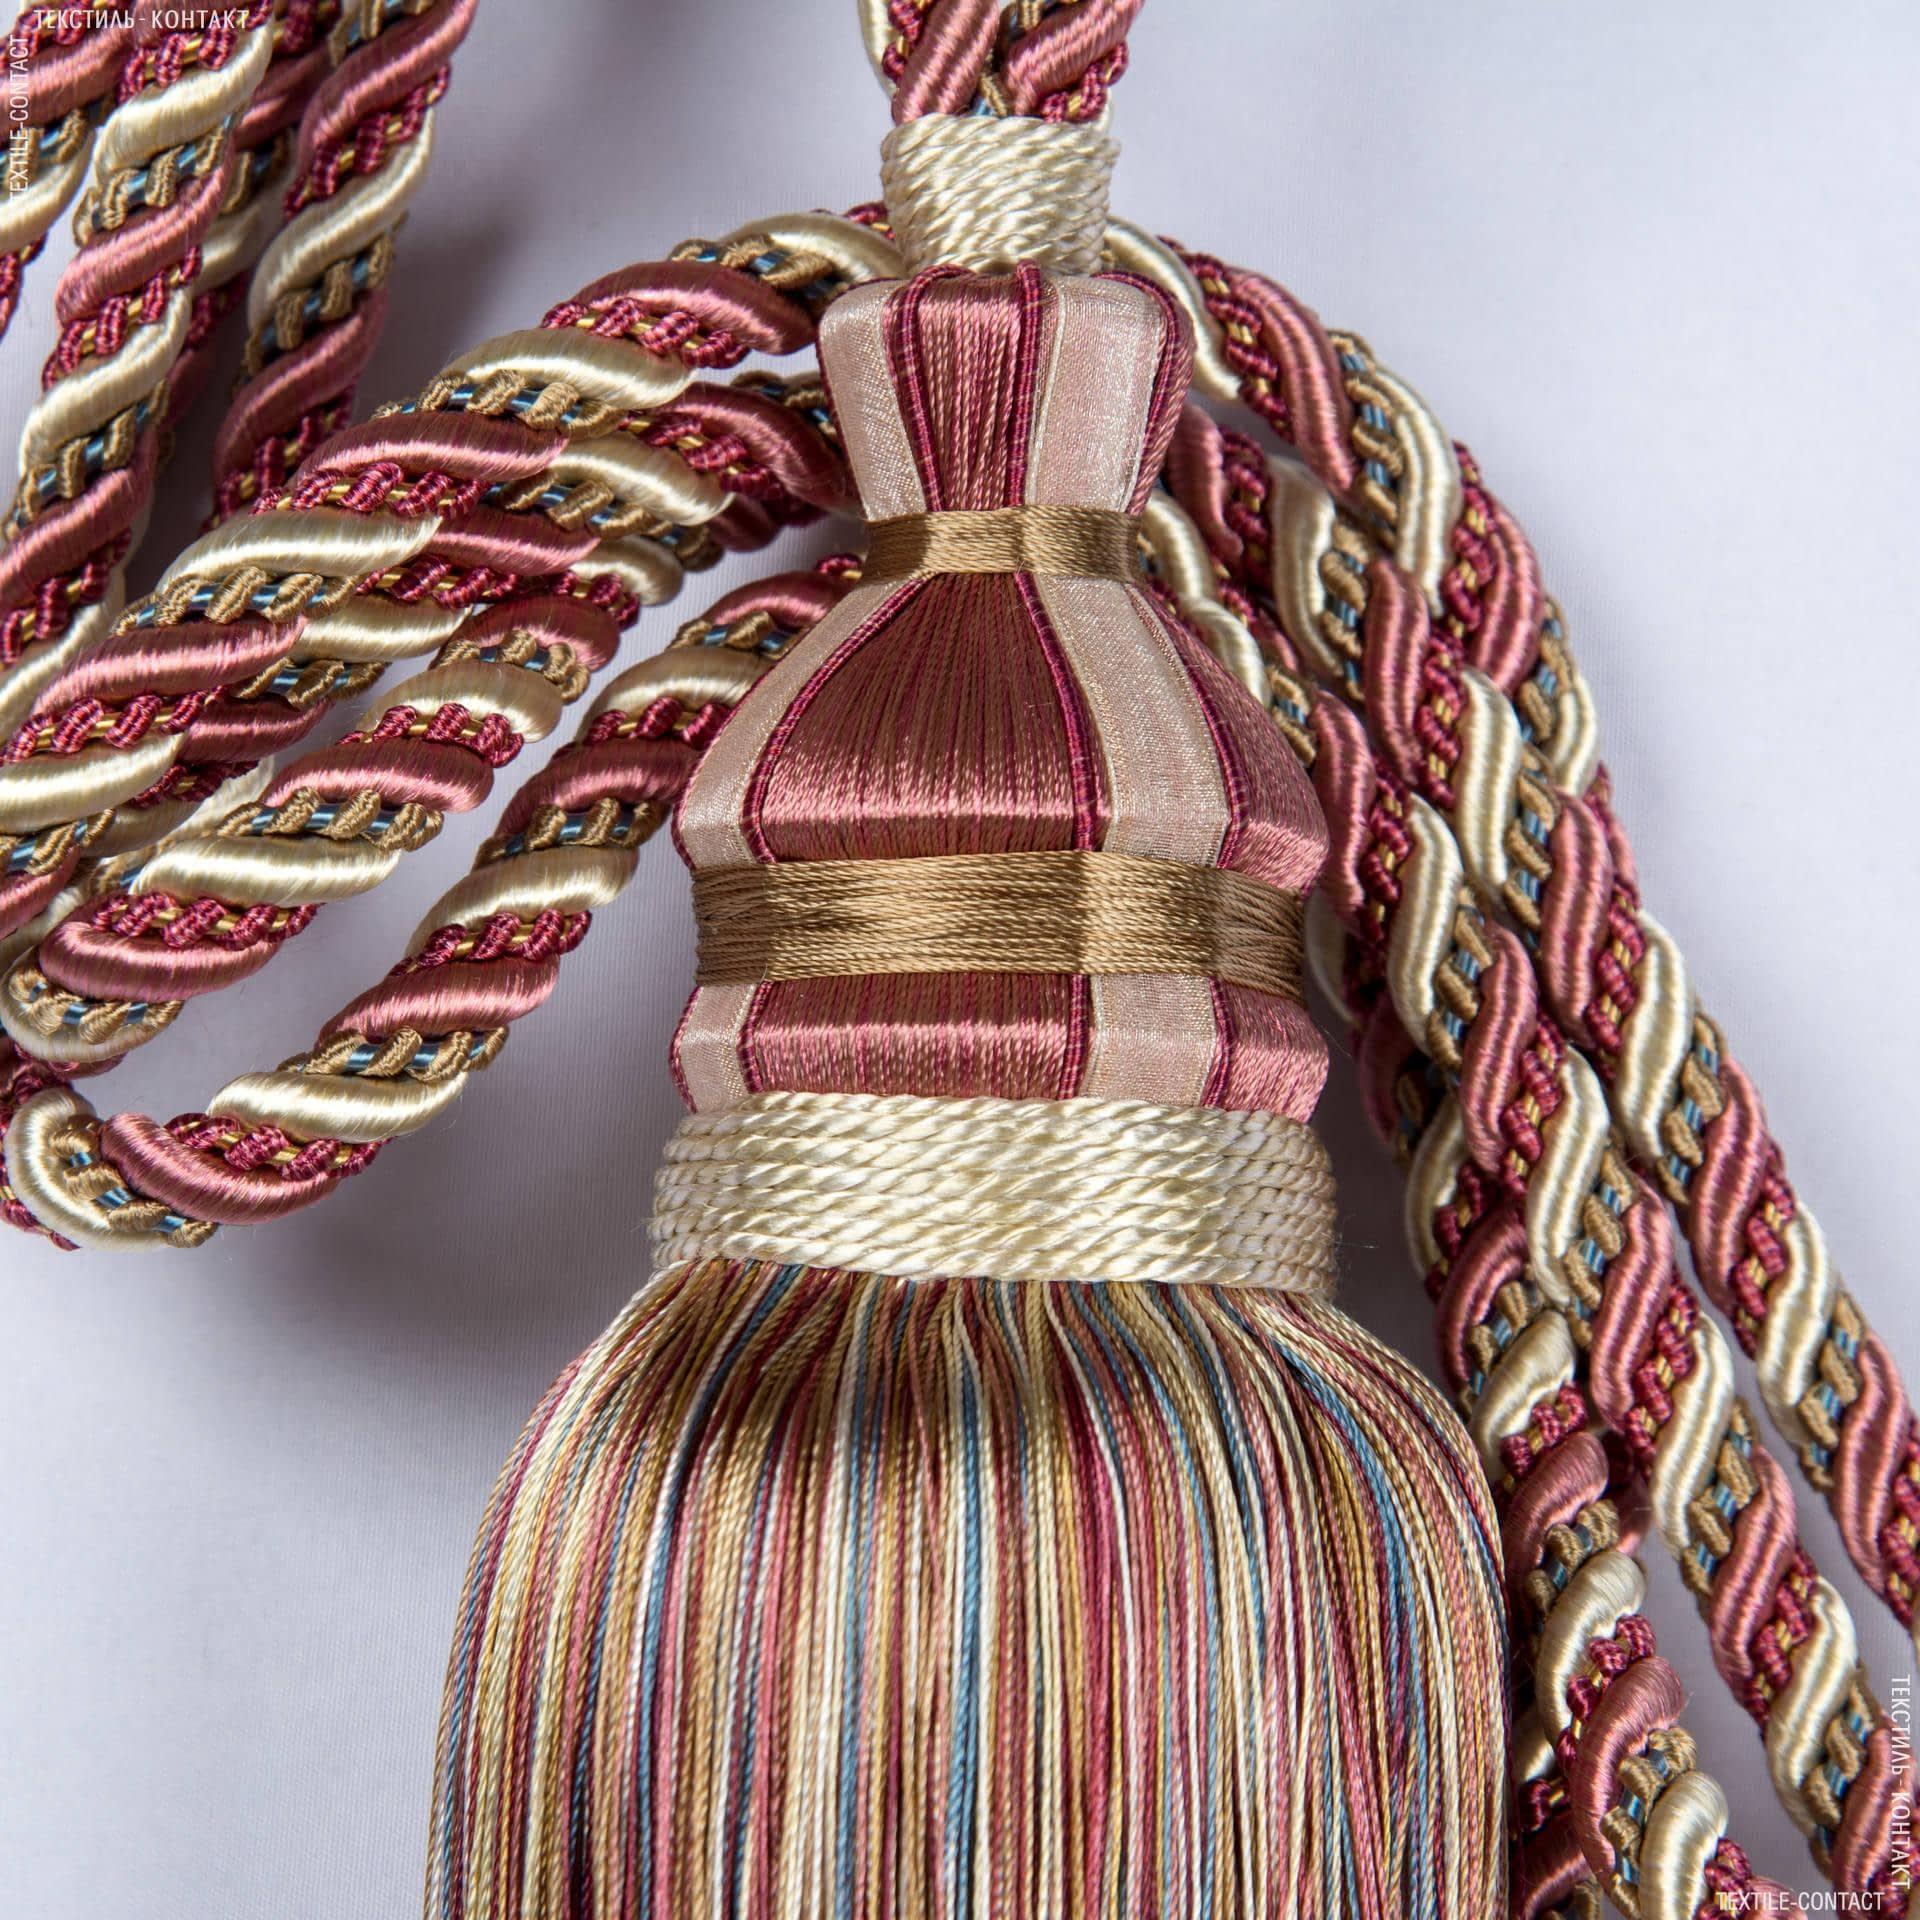 Ткани фурнитура для декора - Кисти бремен меланж фрез-бордо-молочный